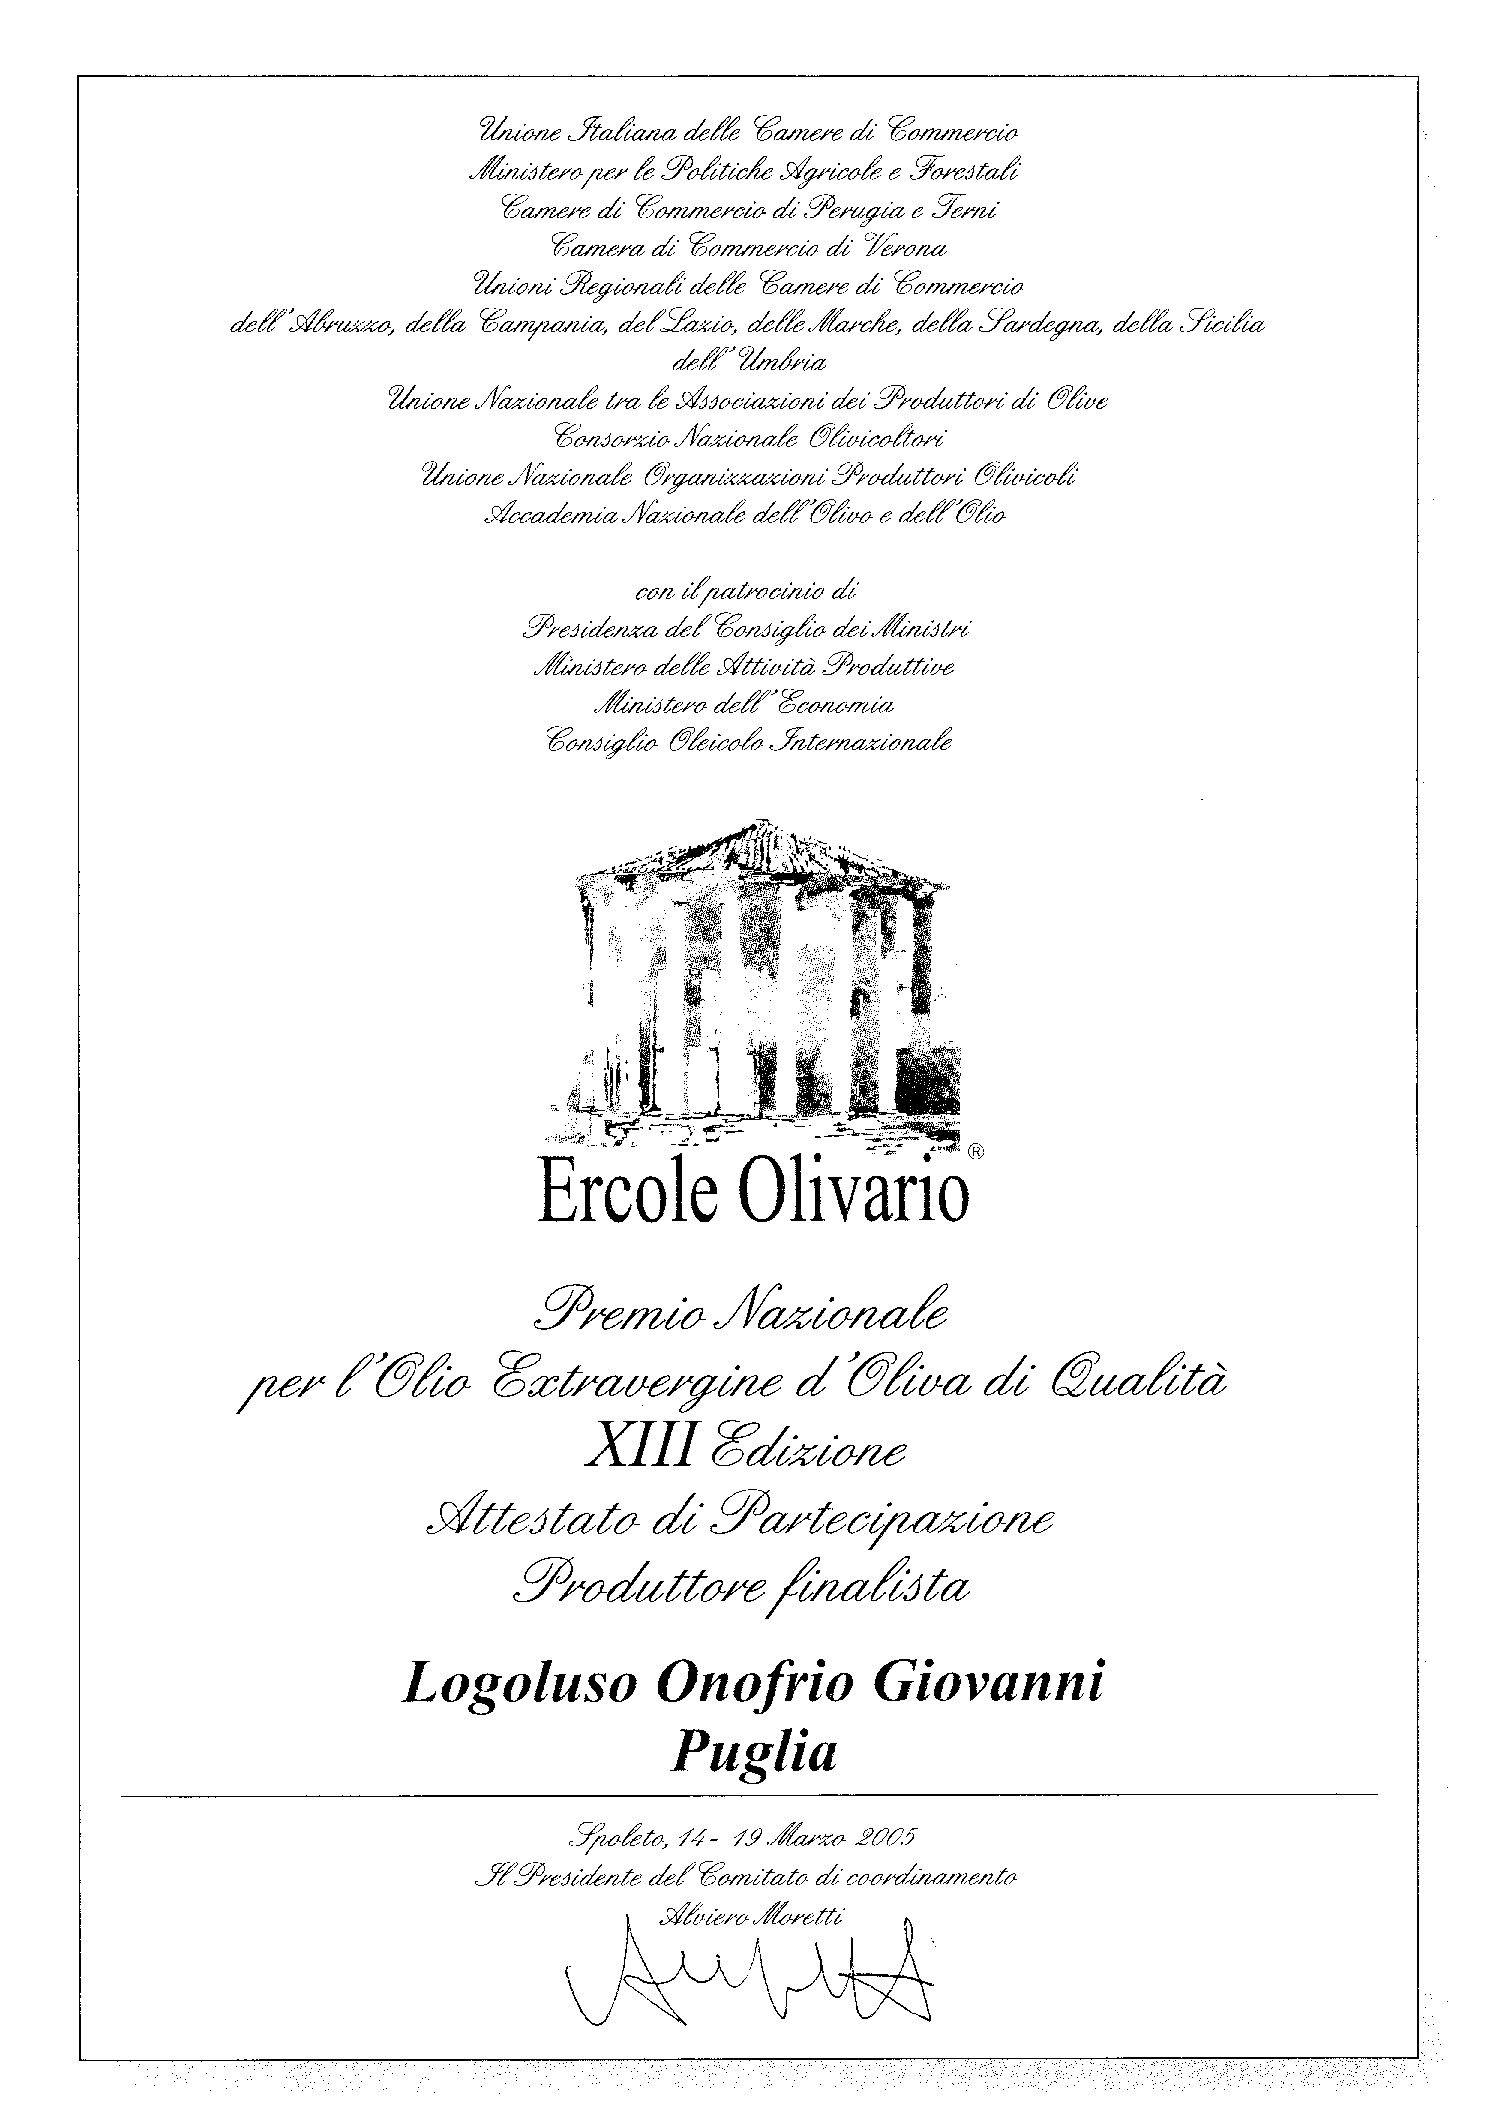 ercole-olivario-frantoio-logoluso